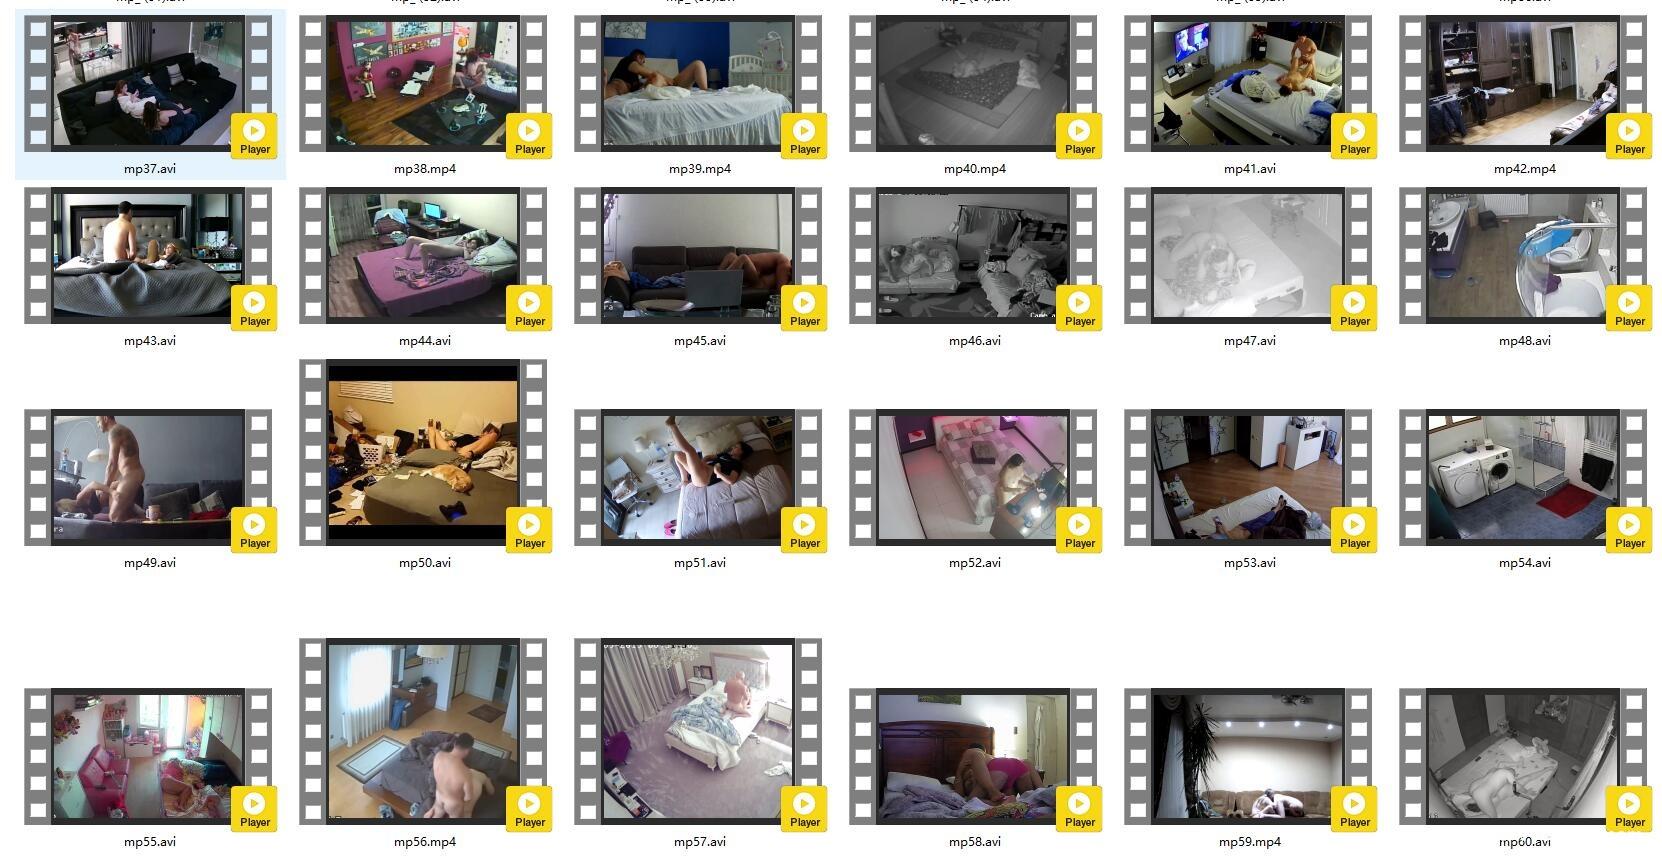 Hacked home cameras (sex, dressing up, etc.)